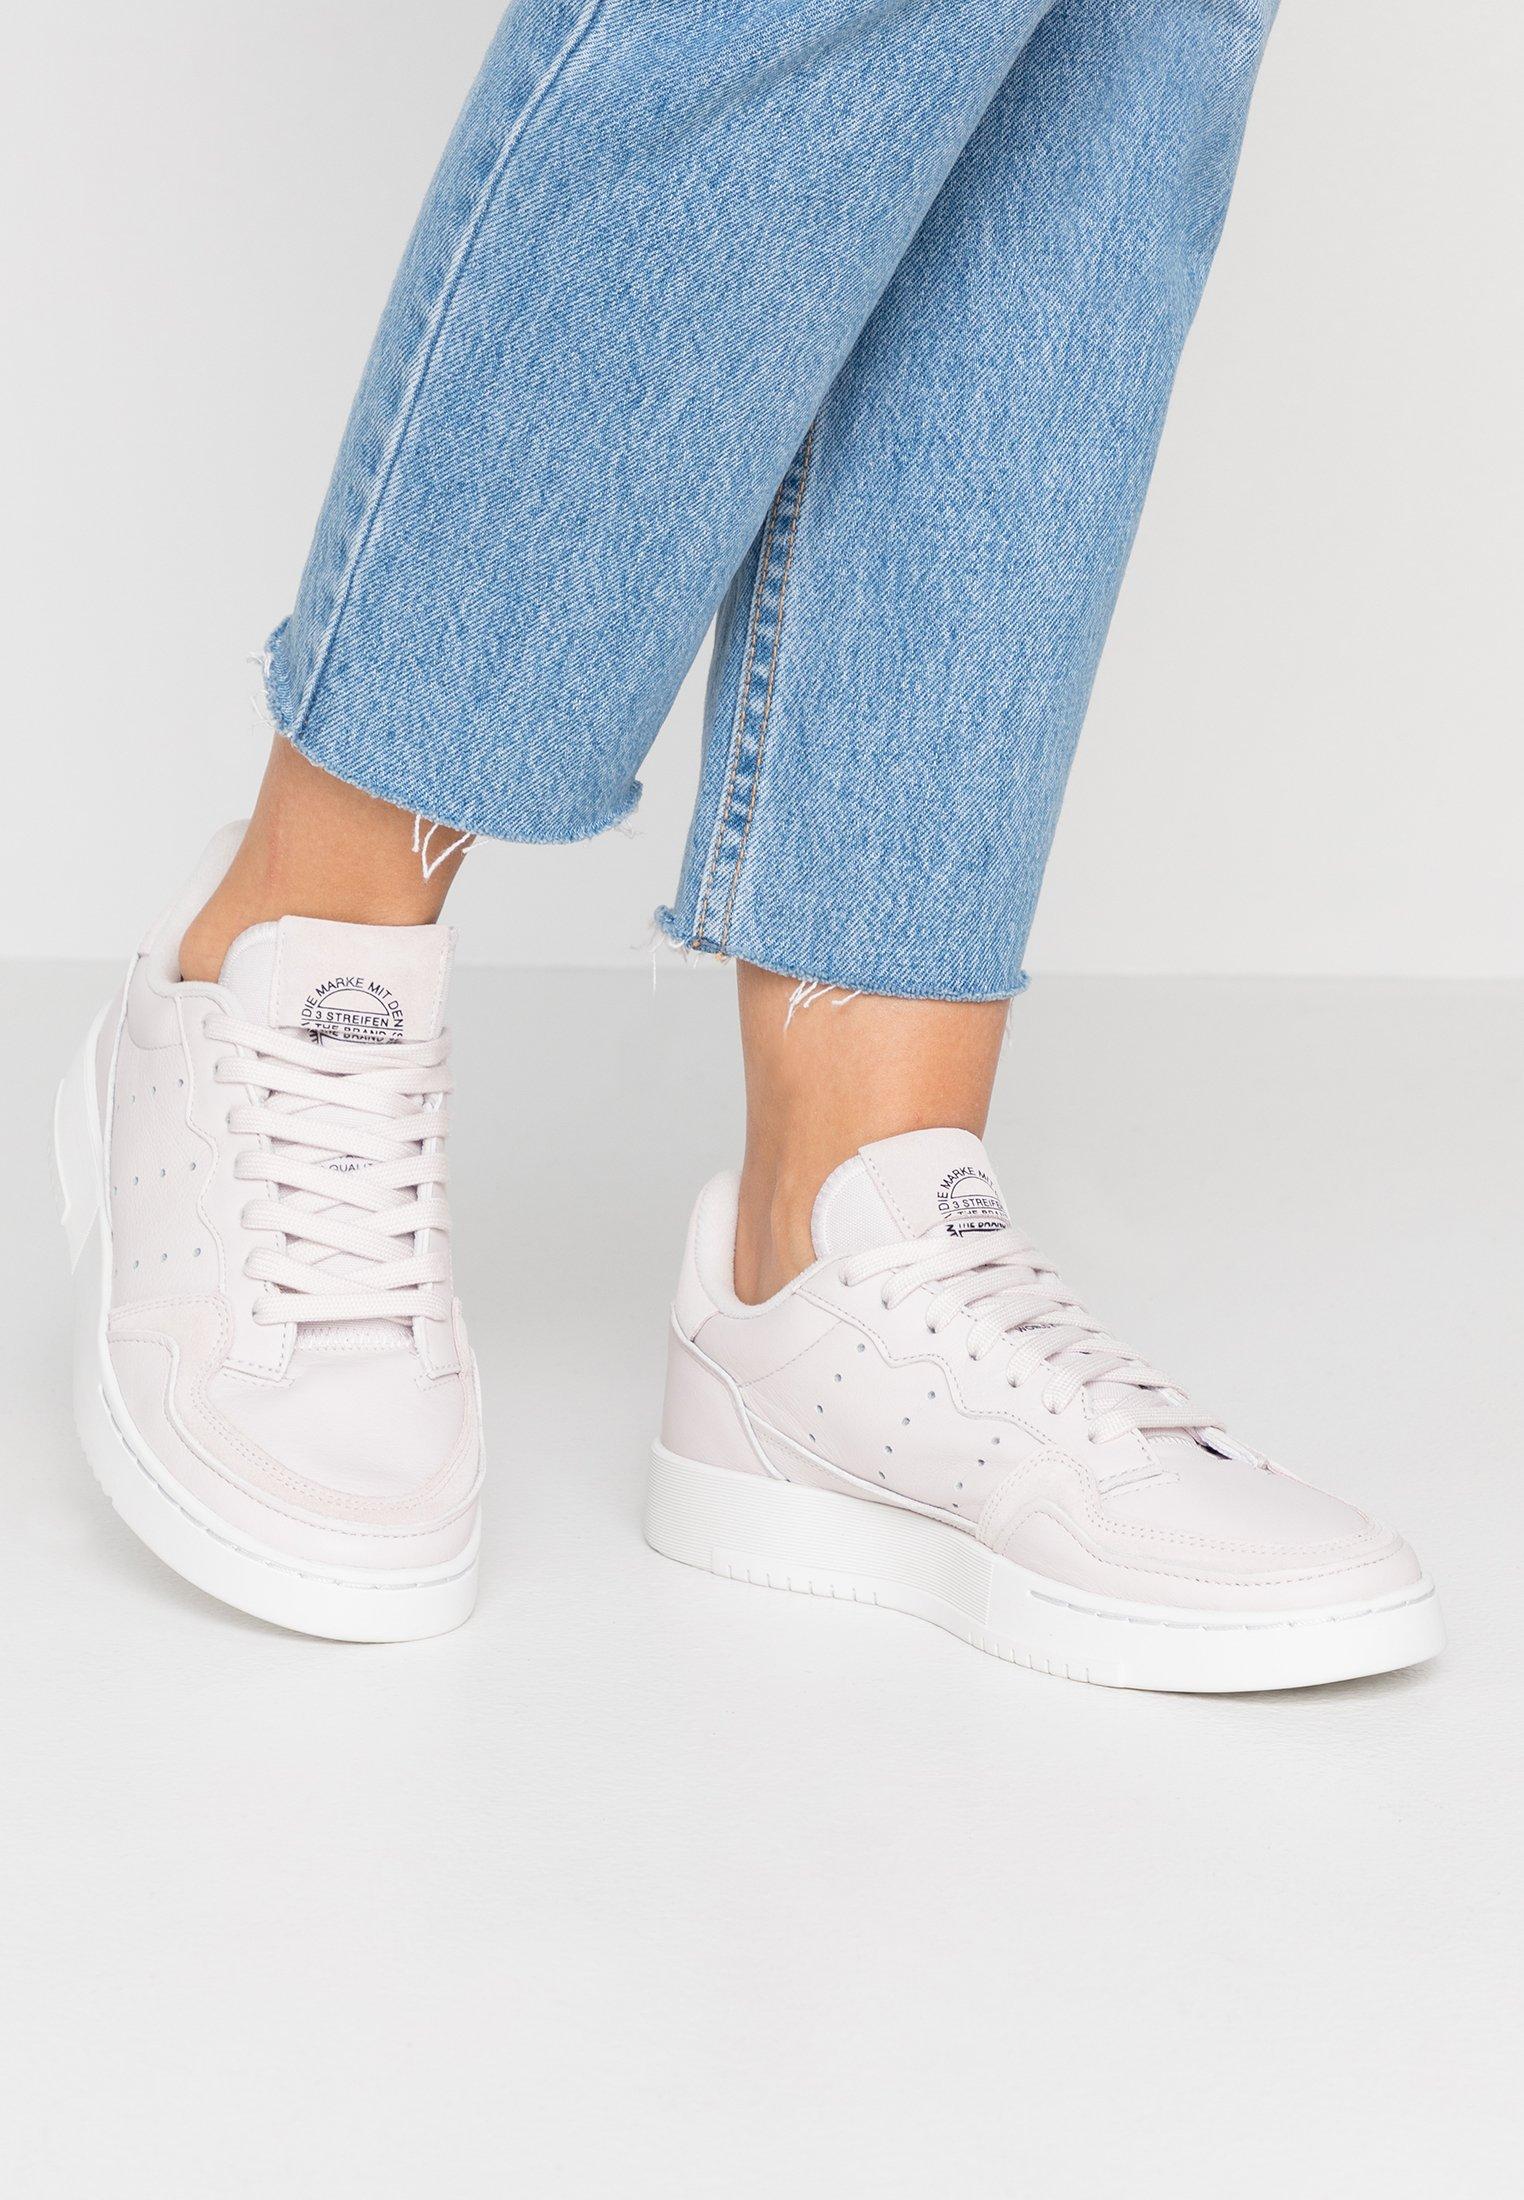 adidas Originals SUPERCOURT W Joggesko vappnkvappnk